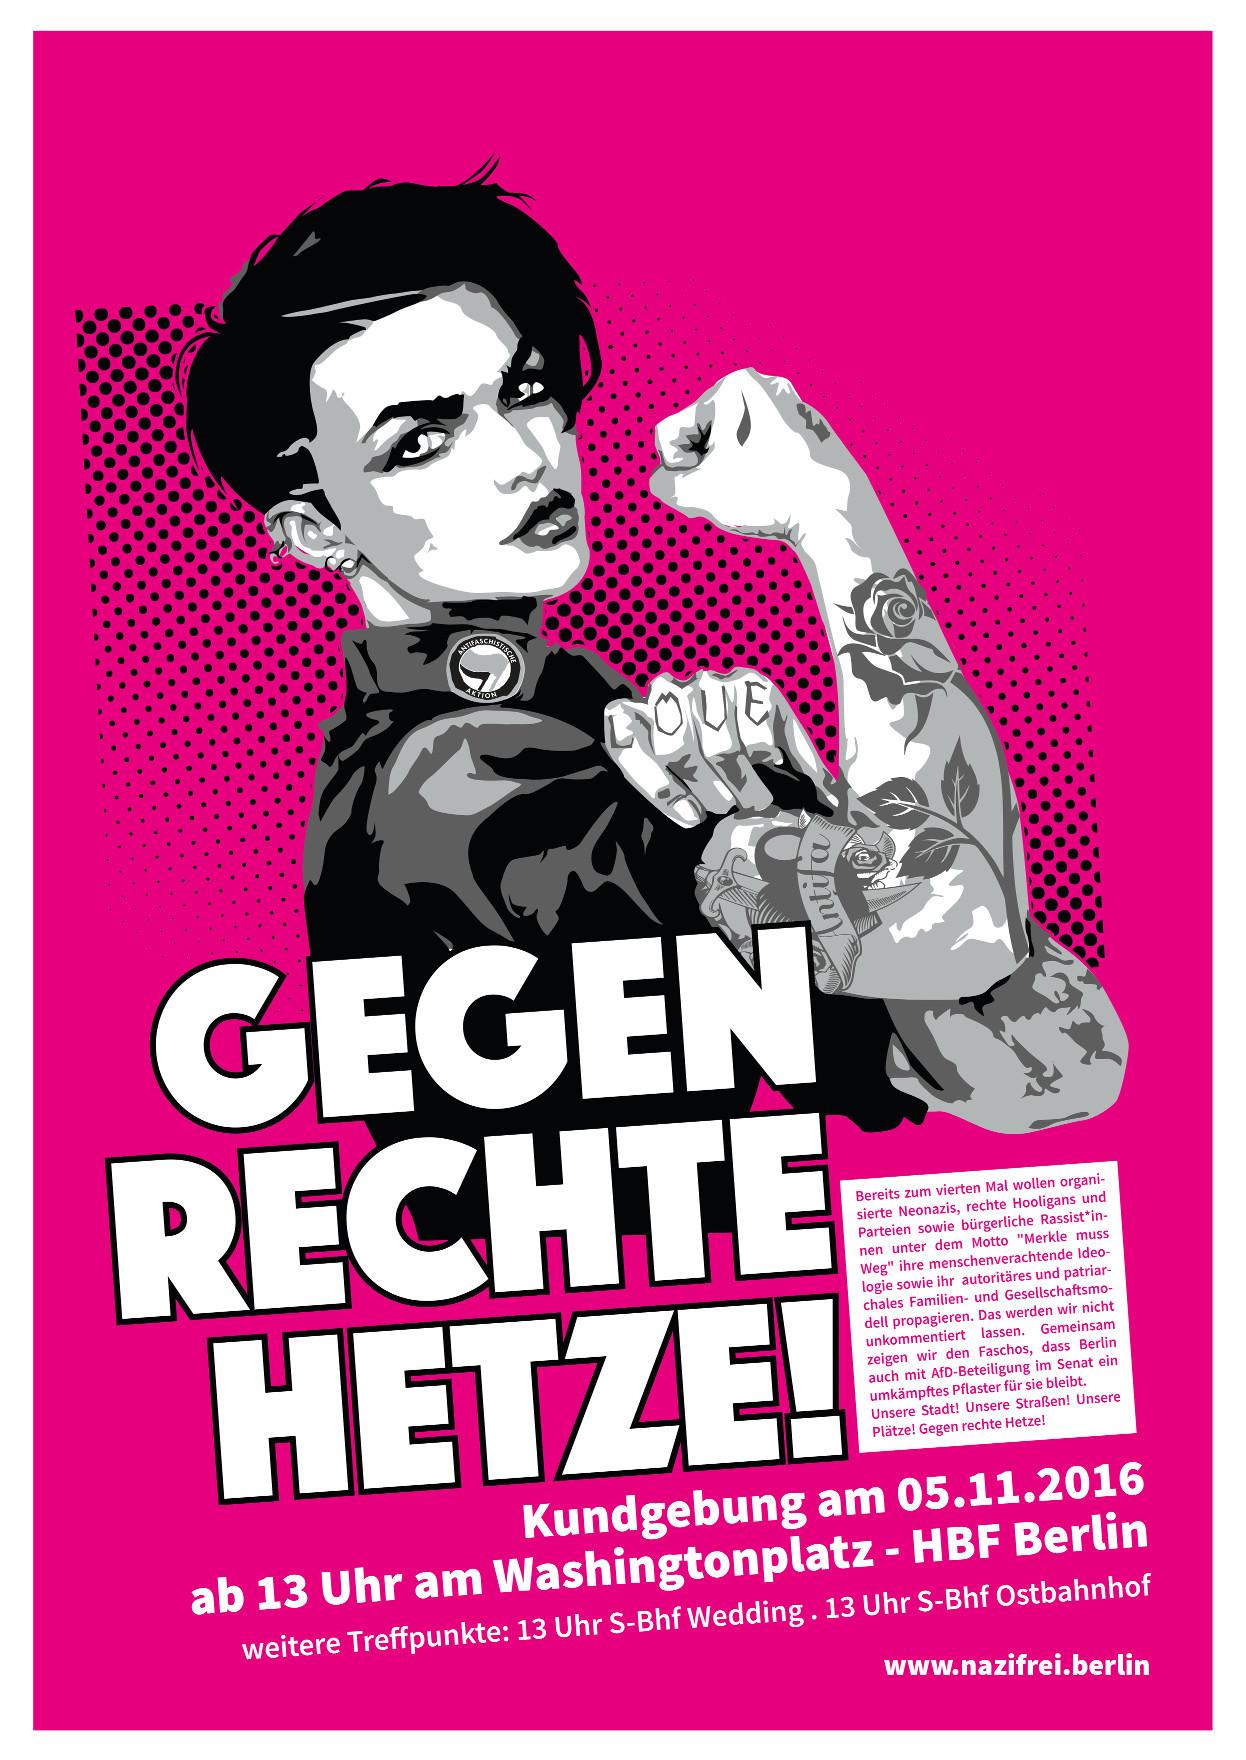 Merkel Muss Weg Antifa Berlininfo